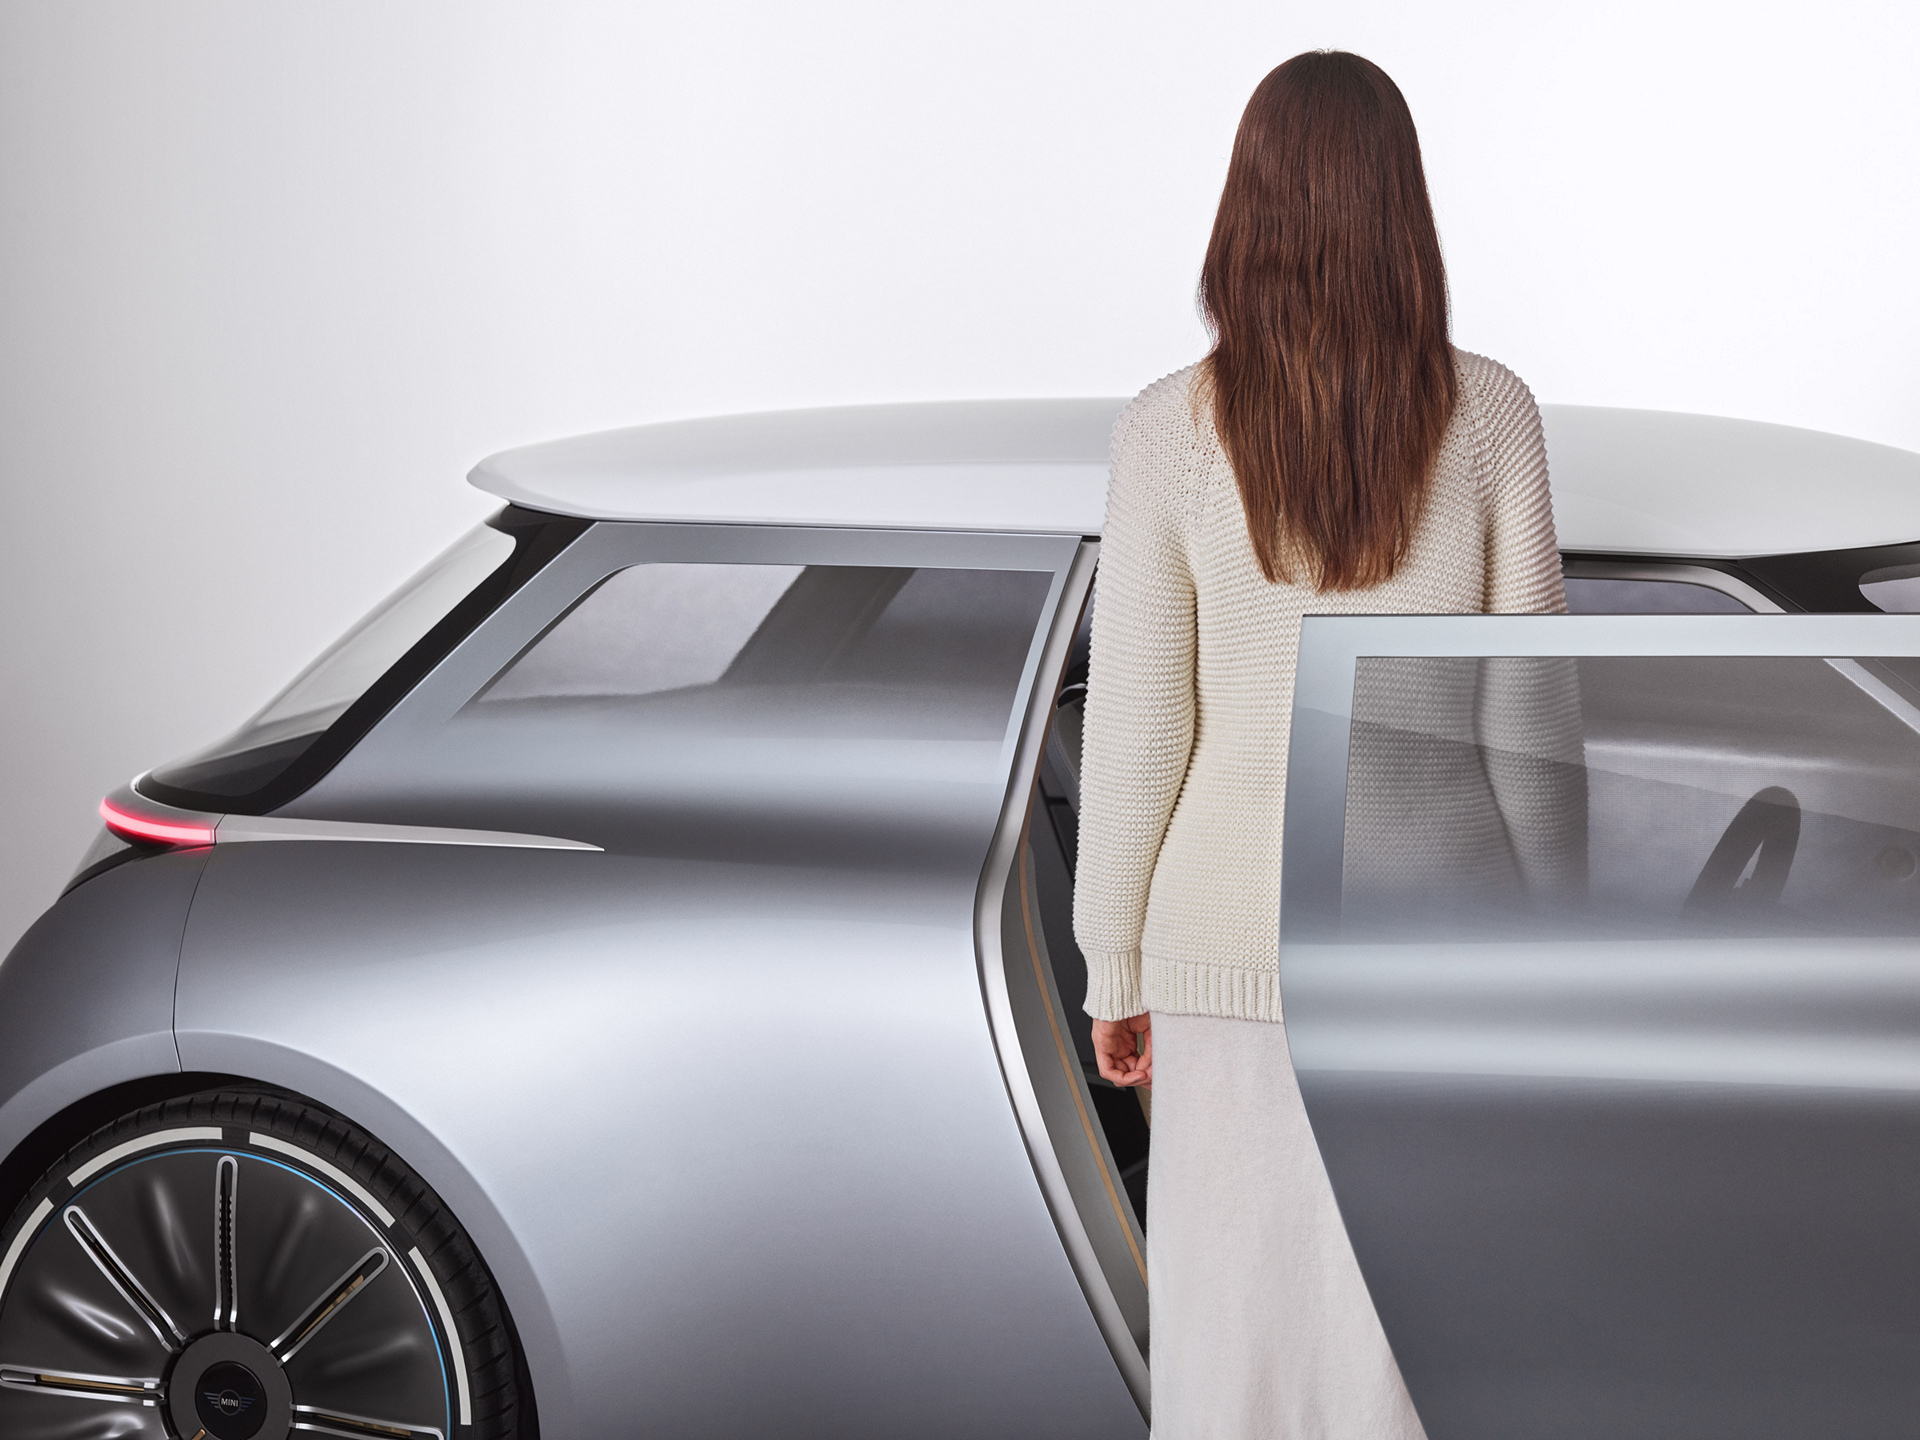 MINI VISION NEXT 100 © BMW AG